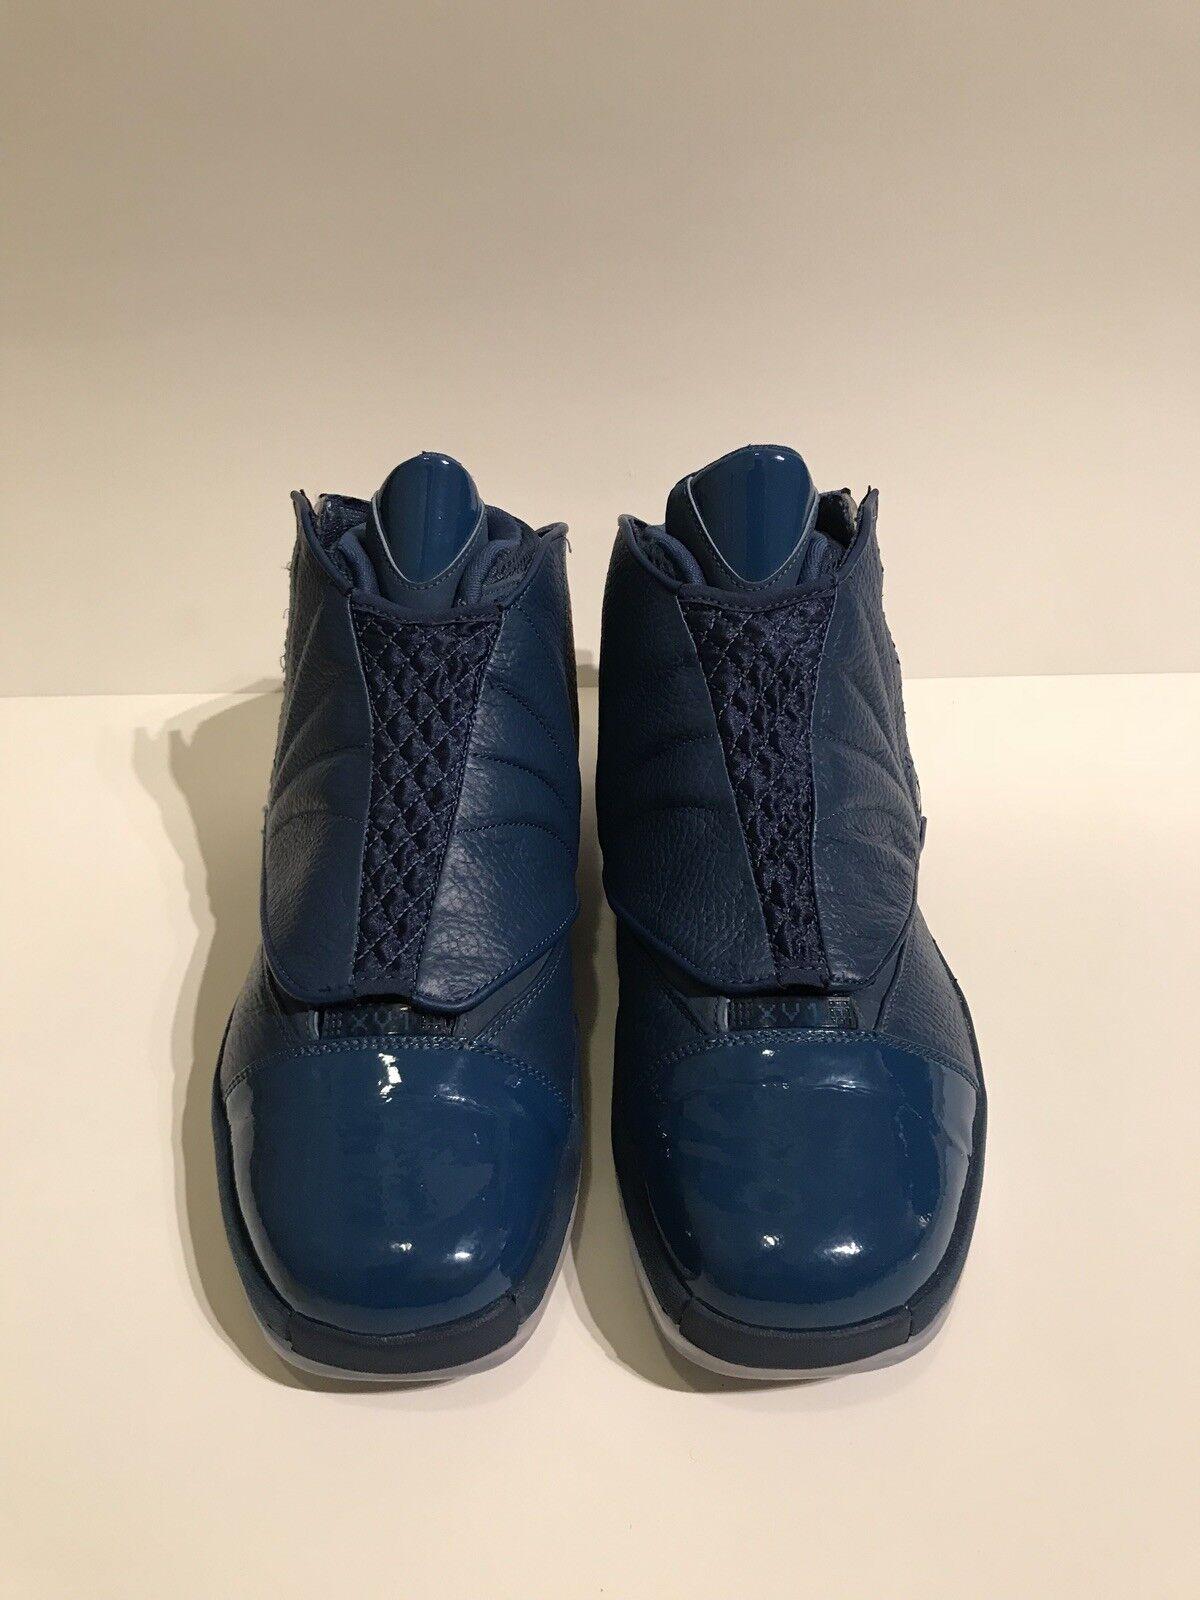 buy online ac84a 3d5fe Nike Air Jordan 16 XVI XVI XVI Retro Trophy Room sz 11 1 2 100%